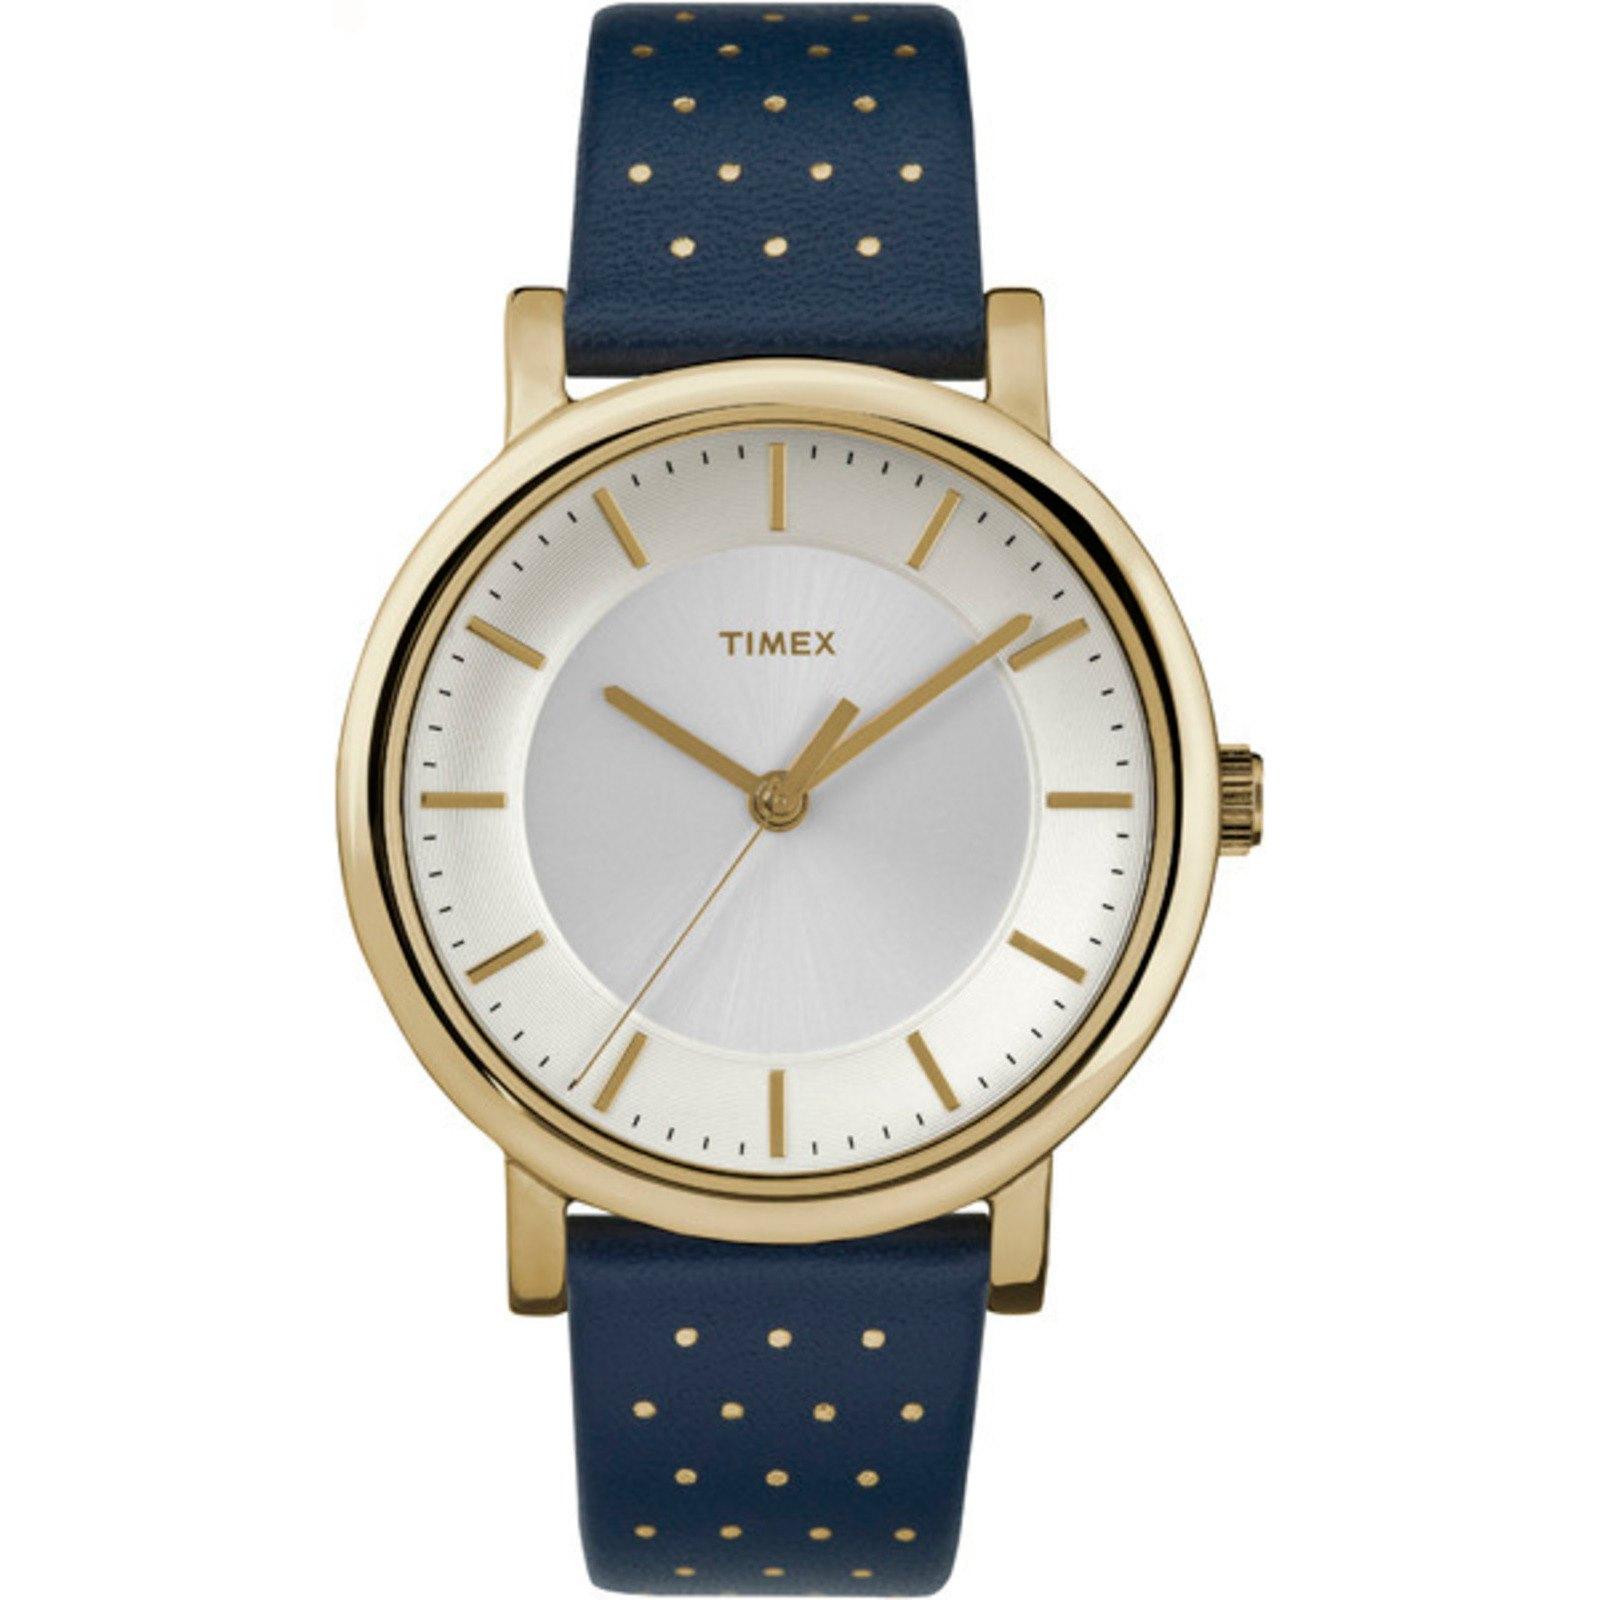 TIMEX Women's Originals 38mm Blue Leather Dress Watch $15.99 + Free Shipping